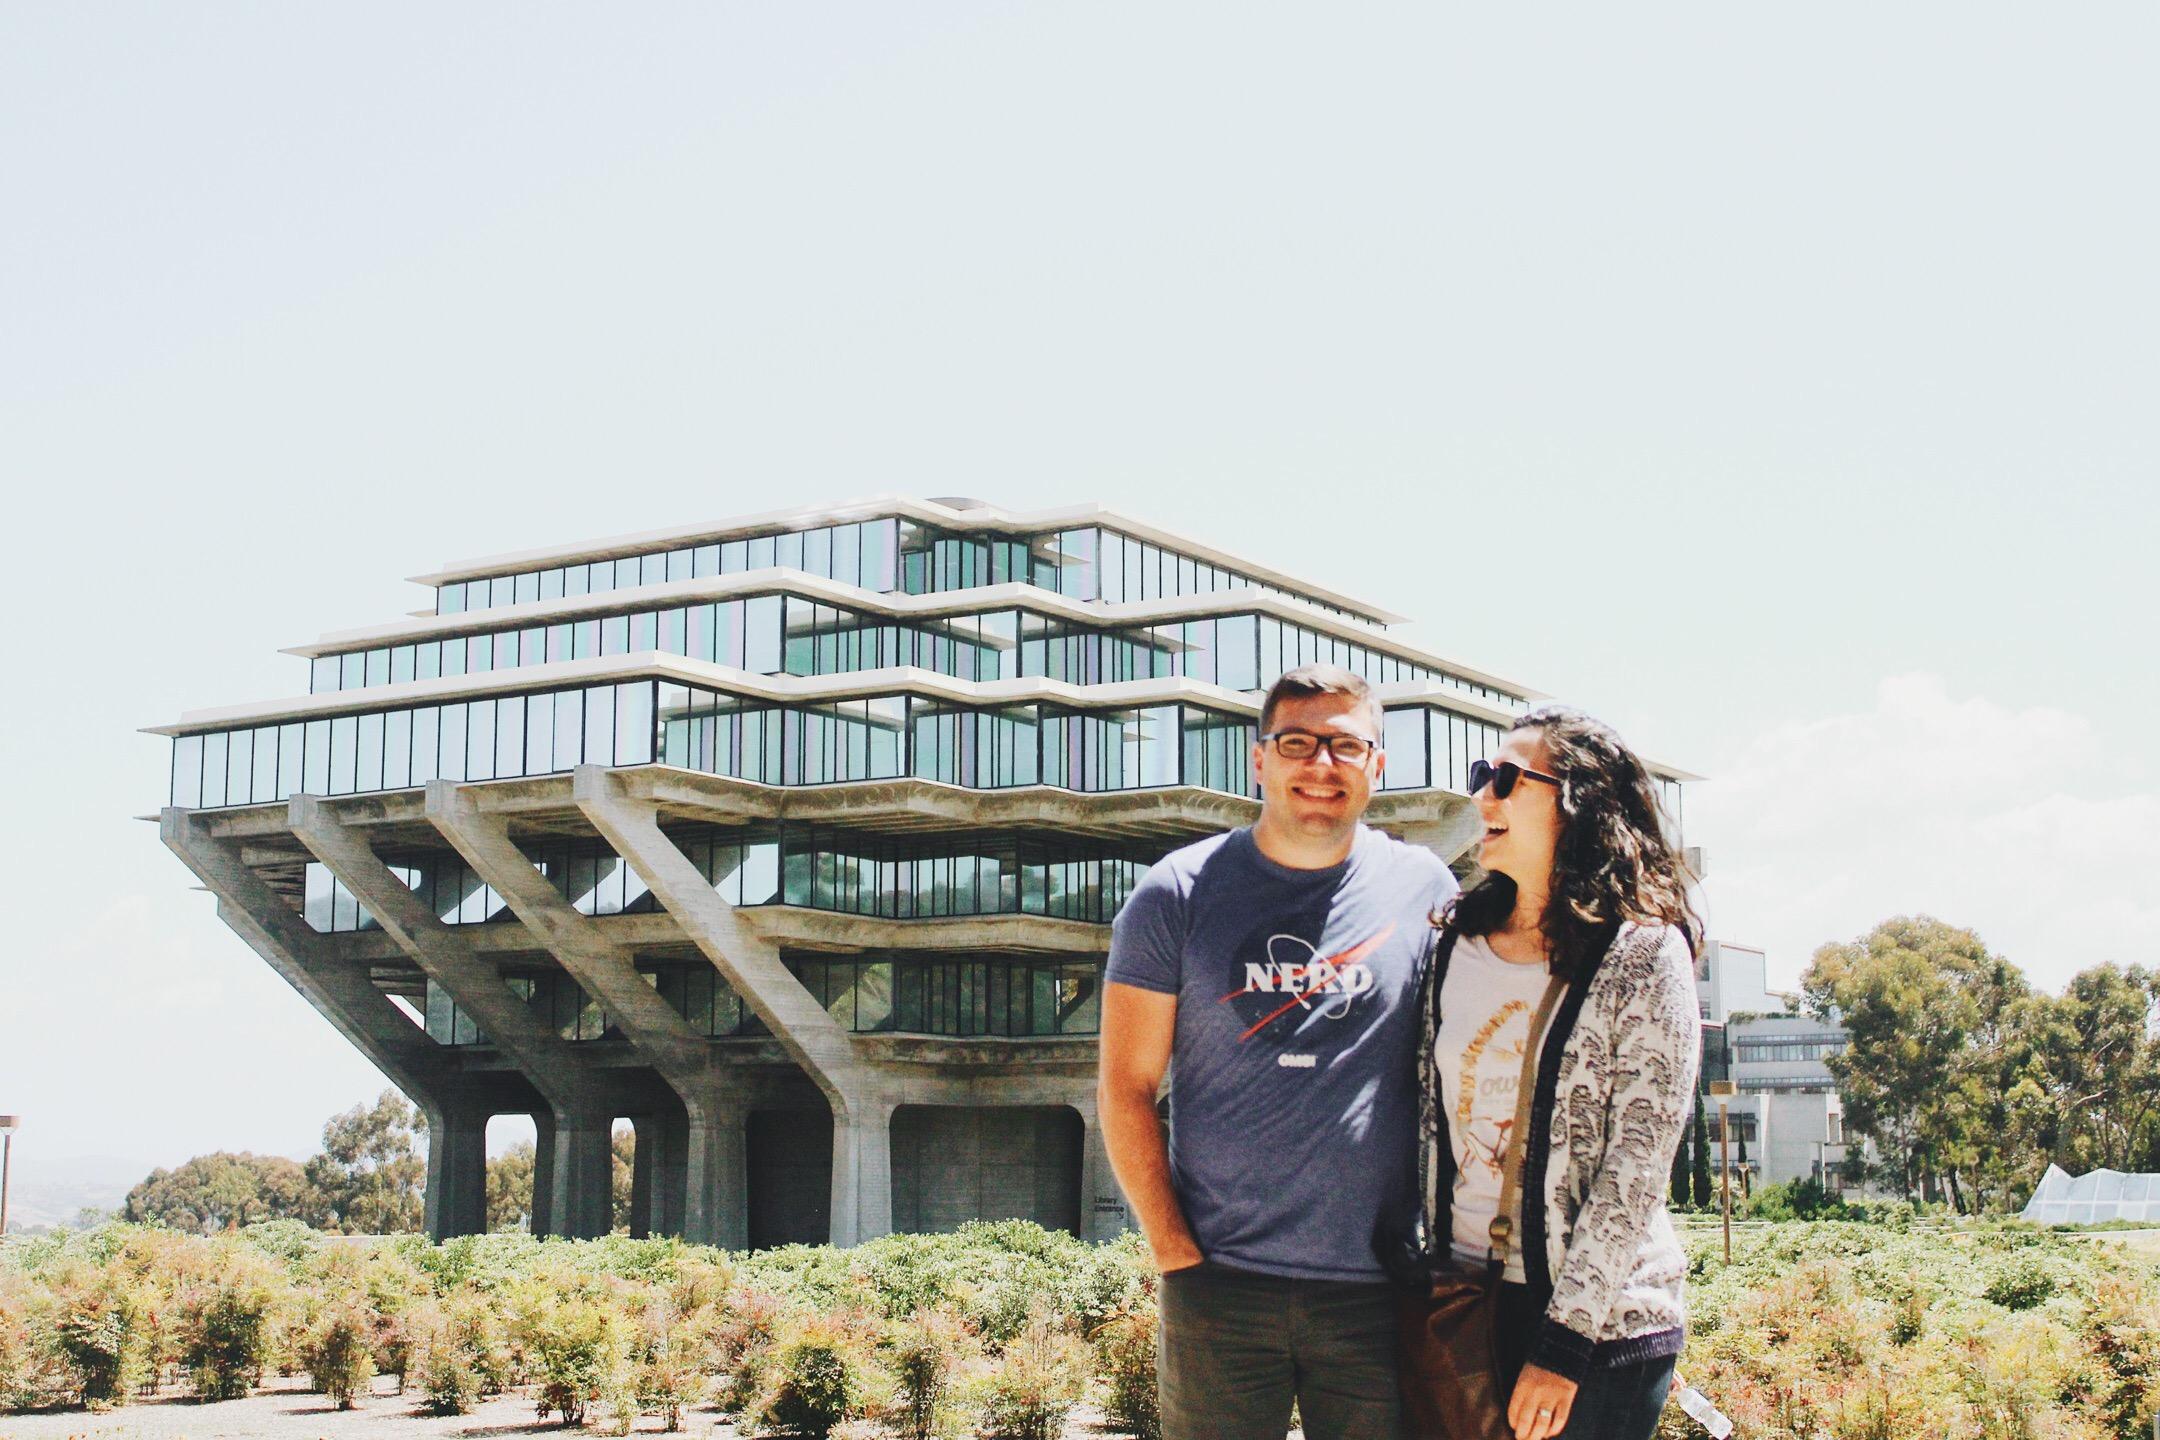 18 Jesse & Raquel in San Diego.JPG